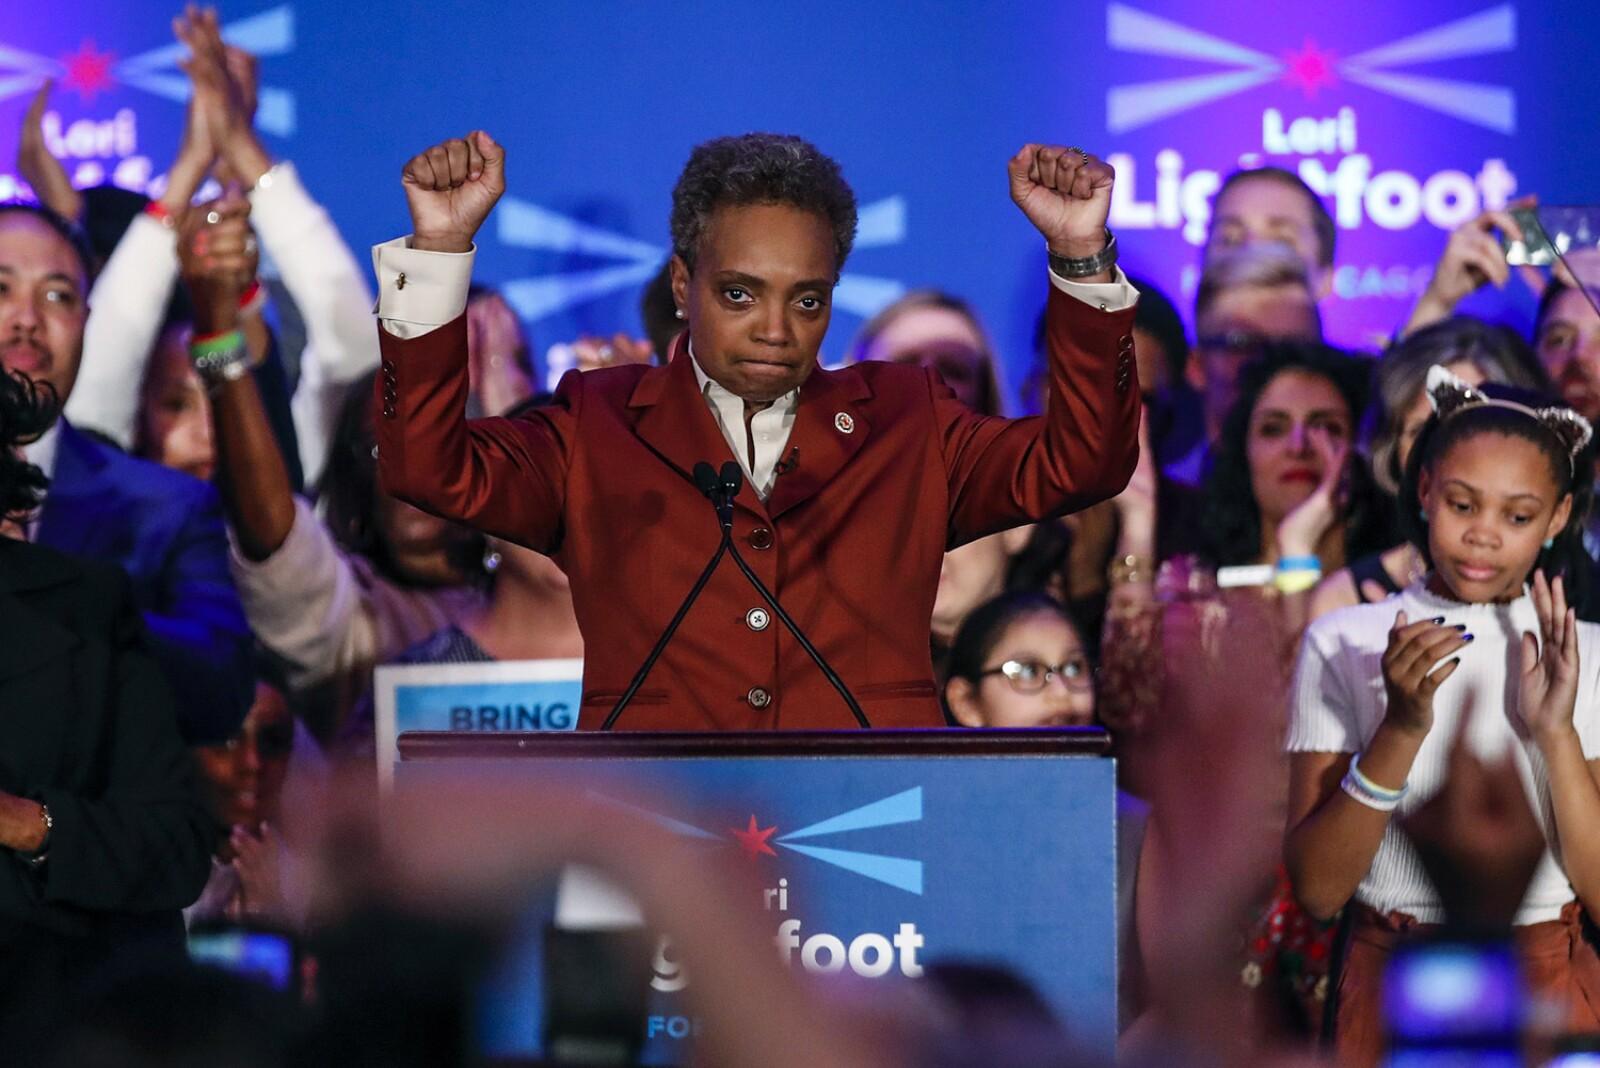 US-POLITICS-ELECTION-VOTE-CHICAGO